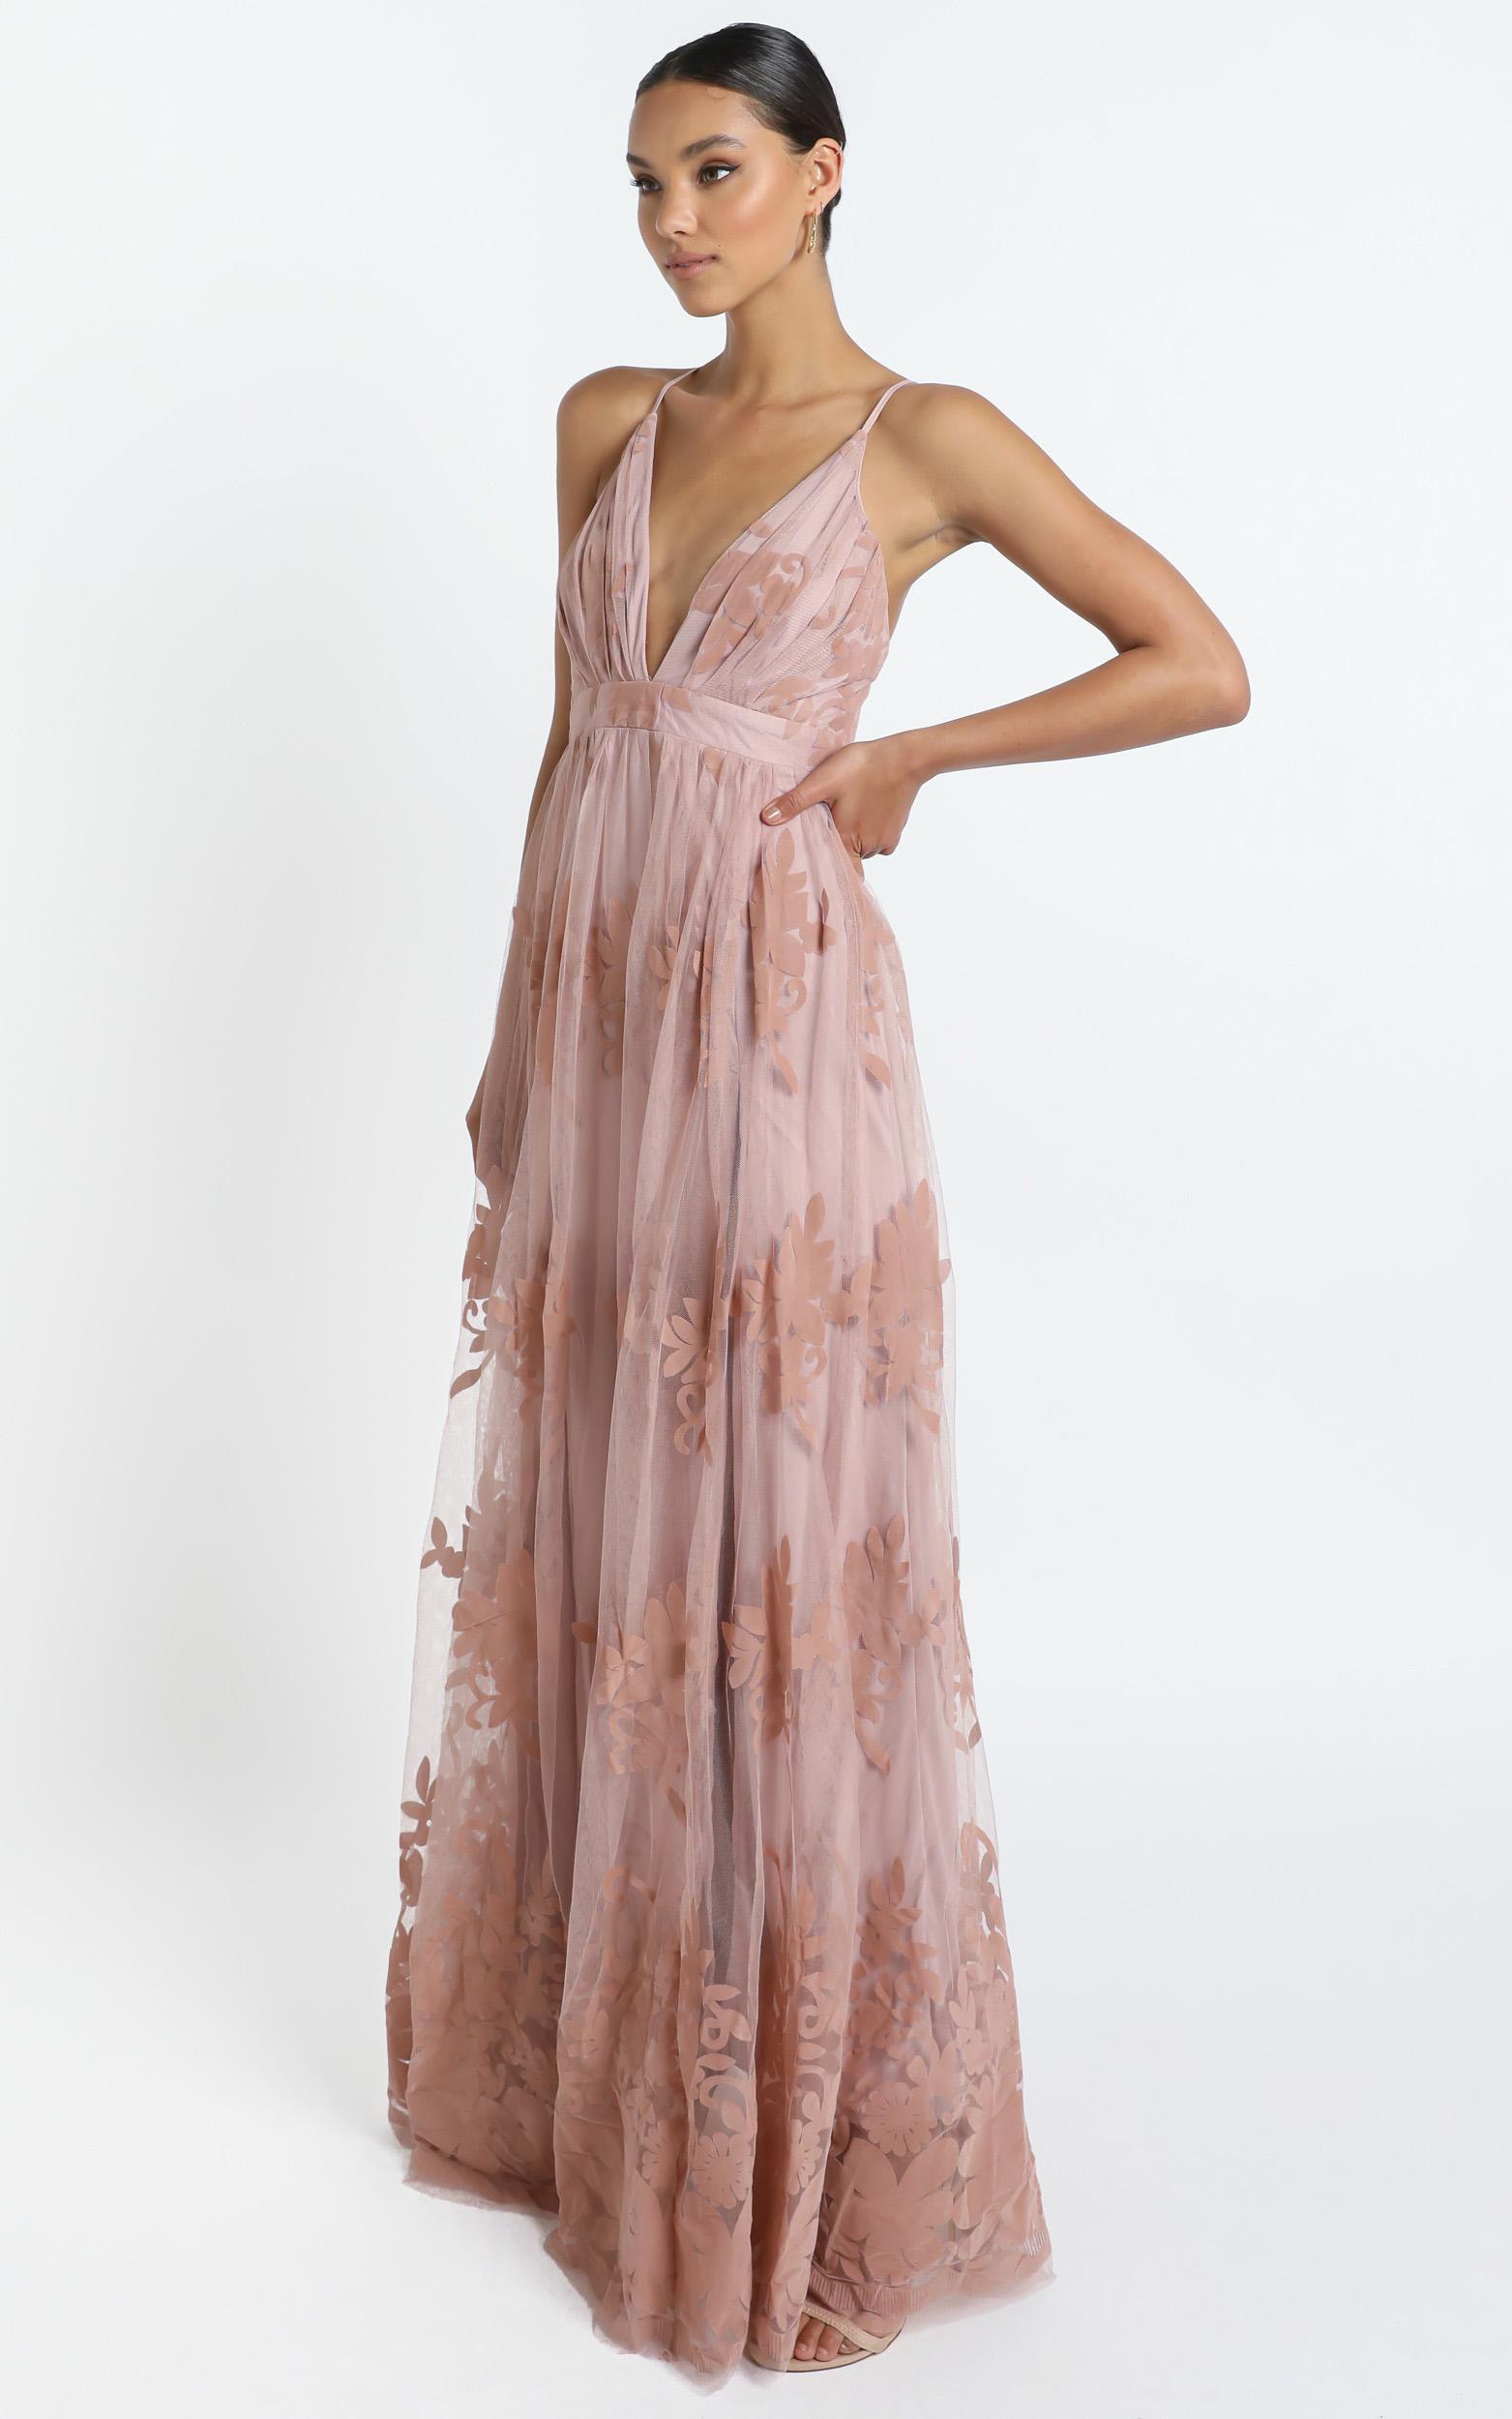 Promenade Maxi Dress In Blush - 16 (XXL), Blush, hi-res image number null